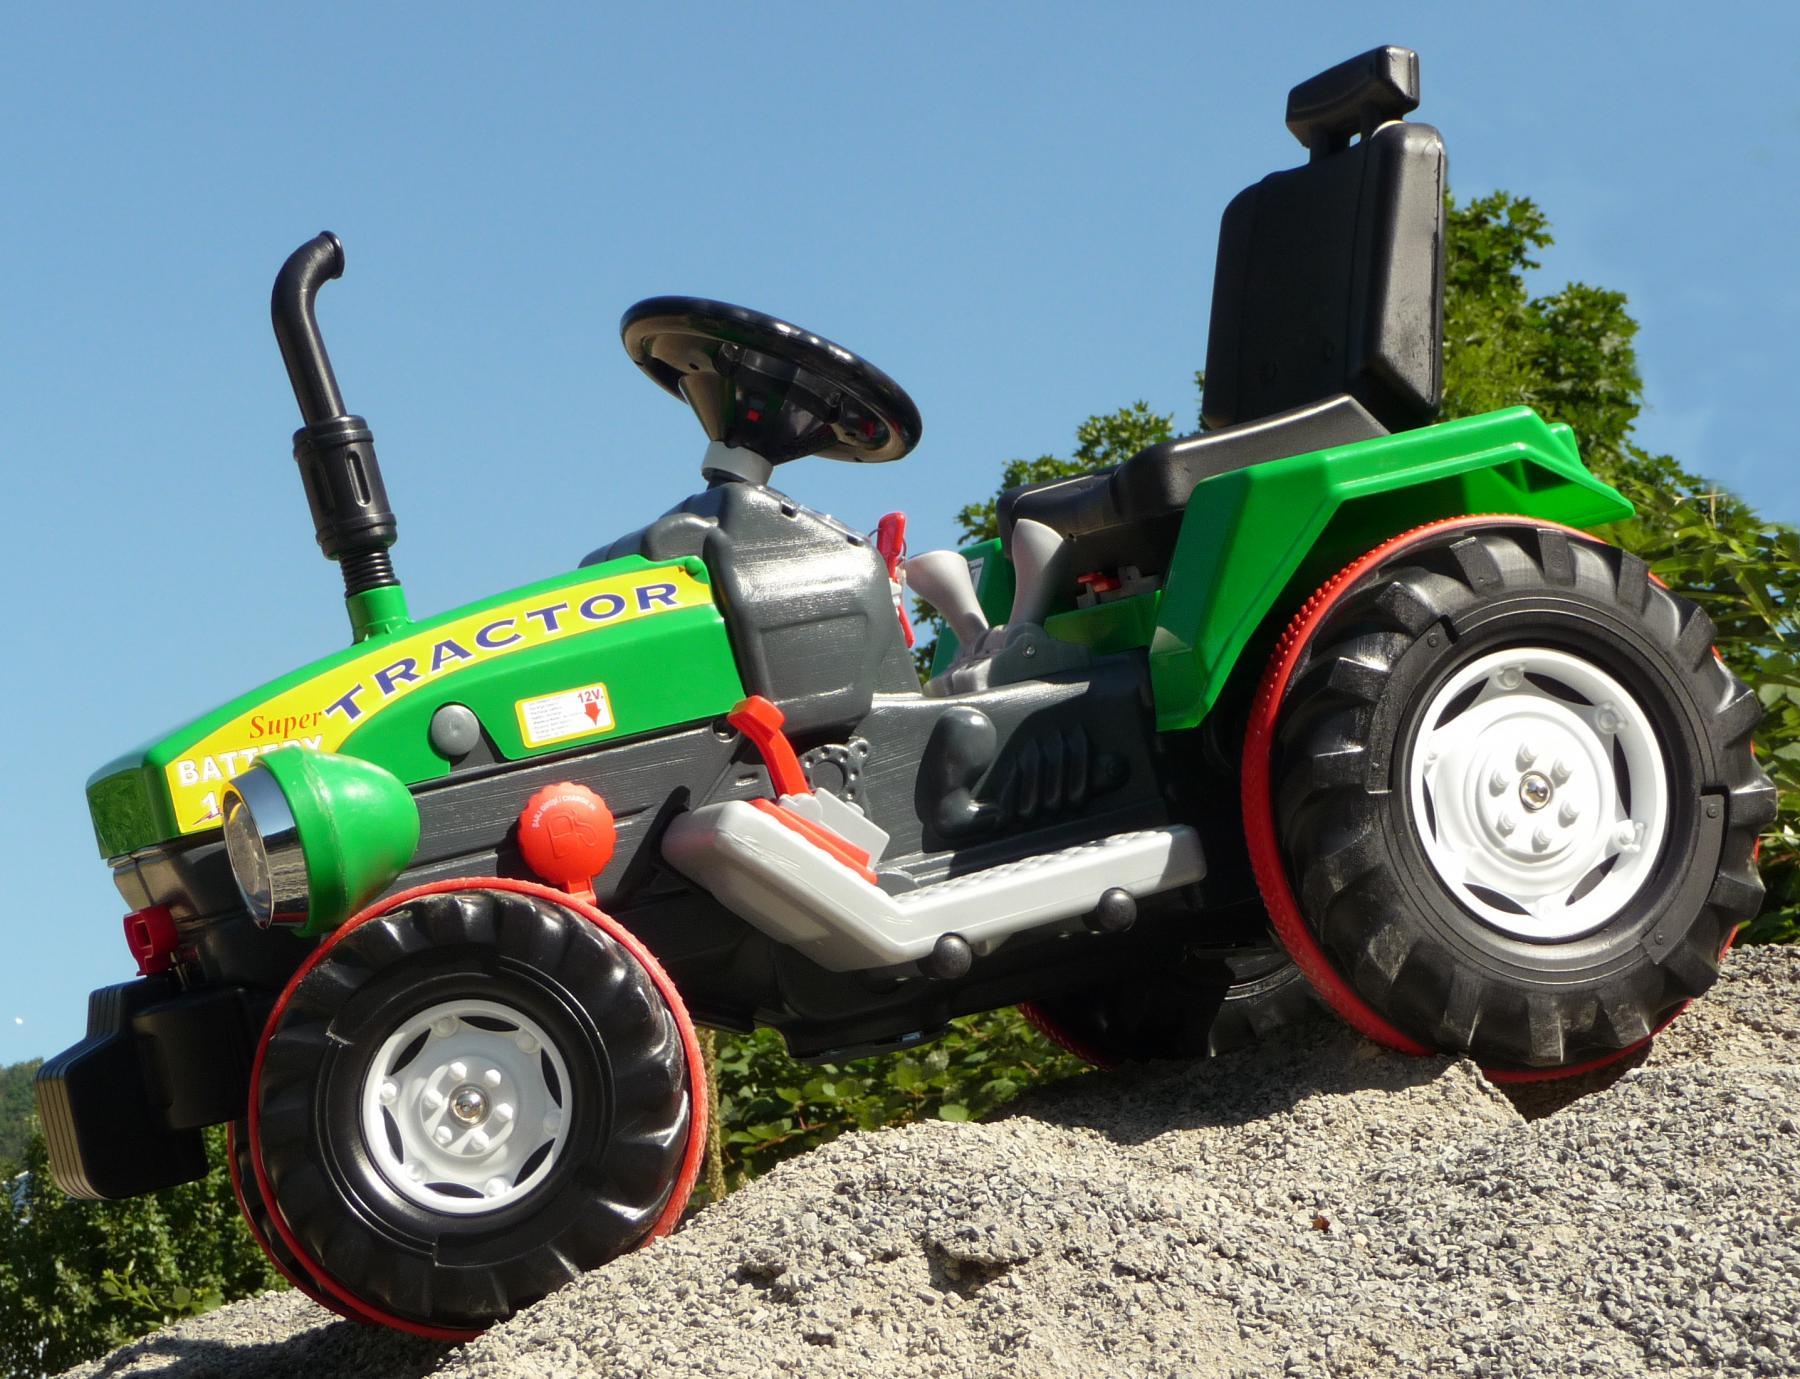 elektro traktor mit turbo speed gang 12 volt akku in top qualit t kaufen bei wim shop. Black Bedroom Furniture Sets. Home Design Ideas